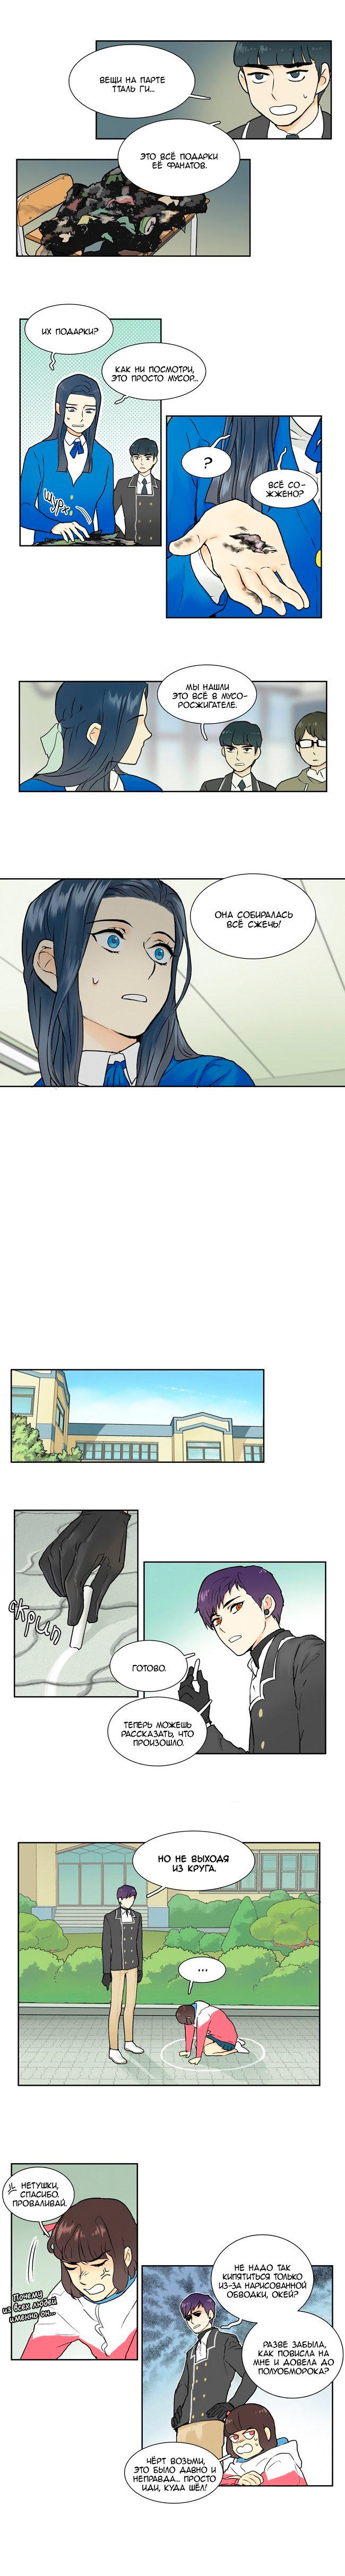 https://r1.ninemanga.com/comics/pic2/41/21609/214764/1428304491857.jpg Page 2